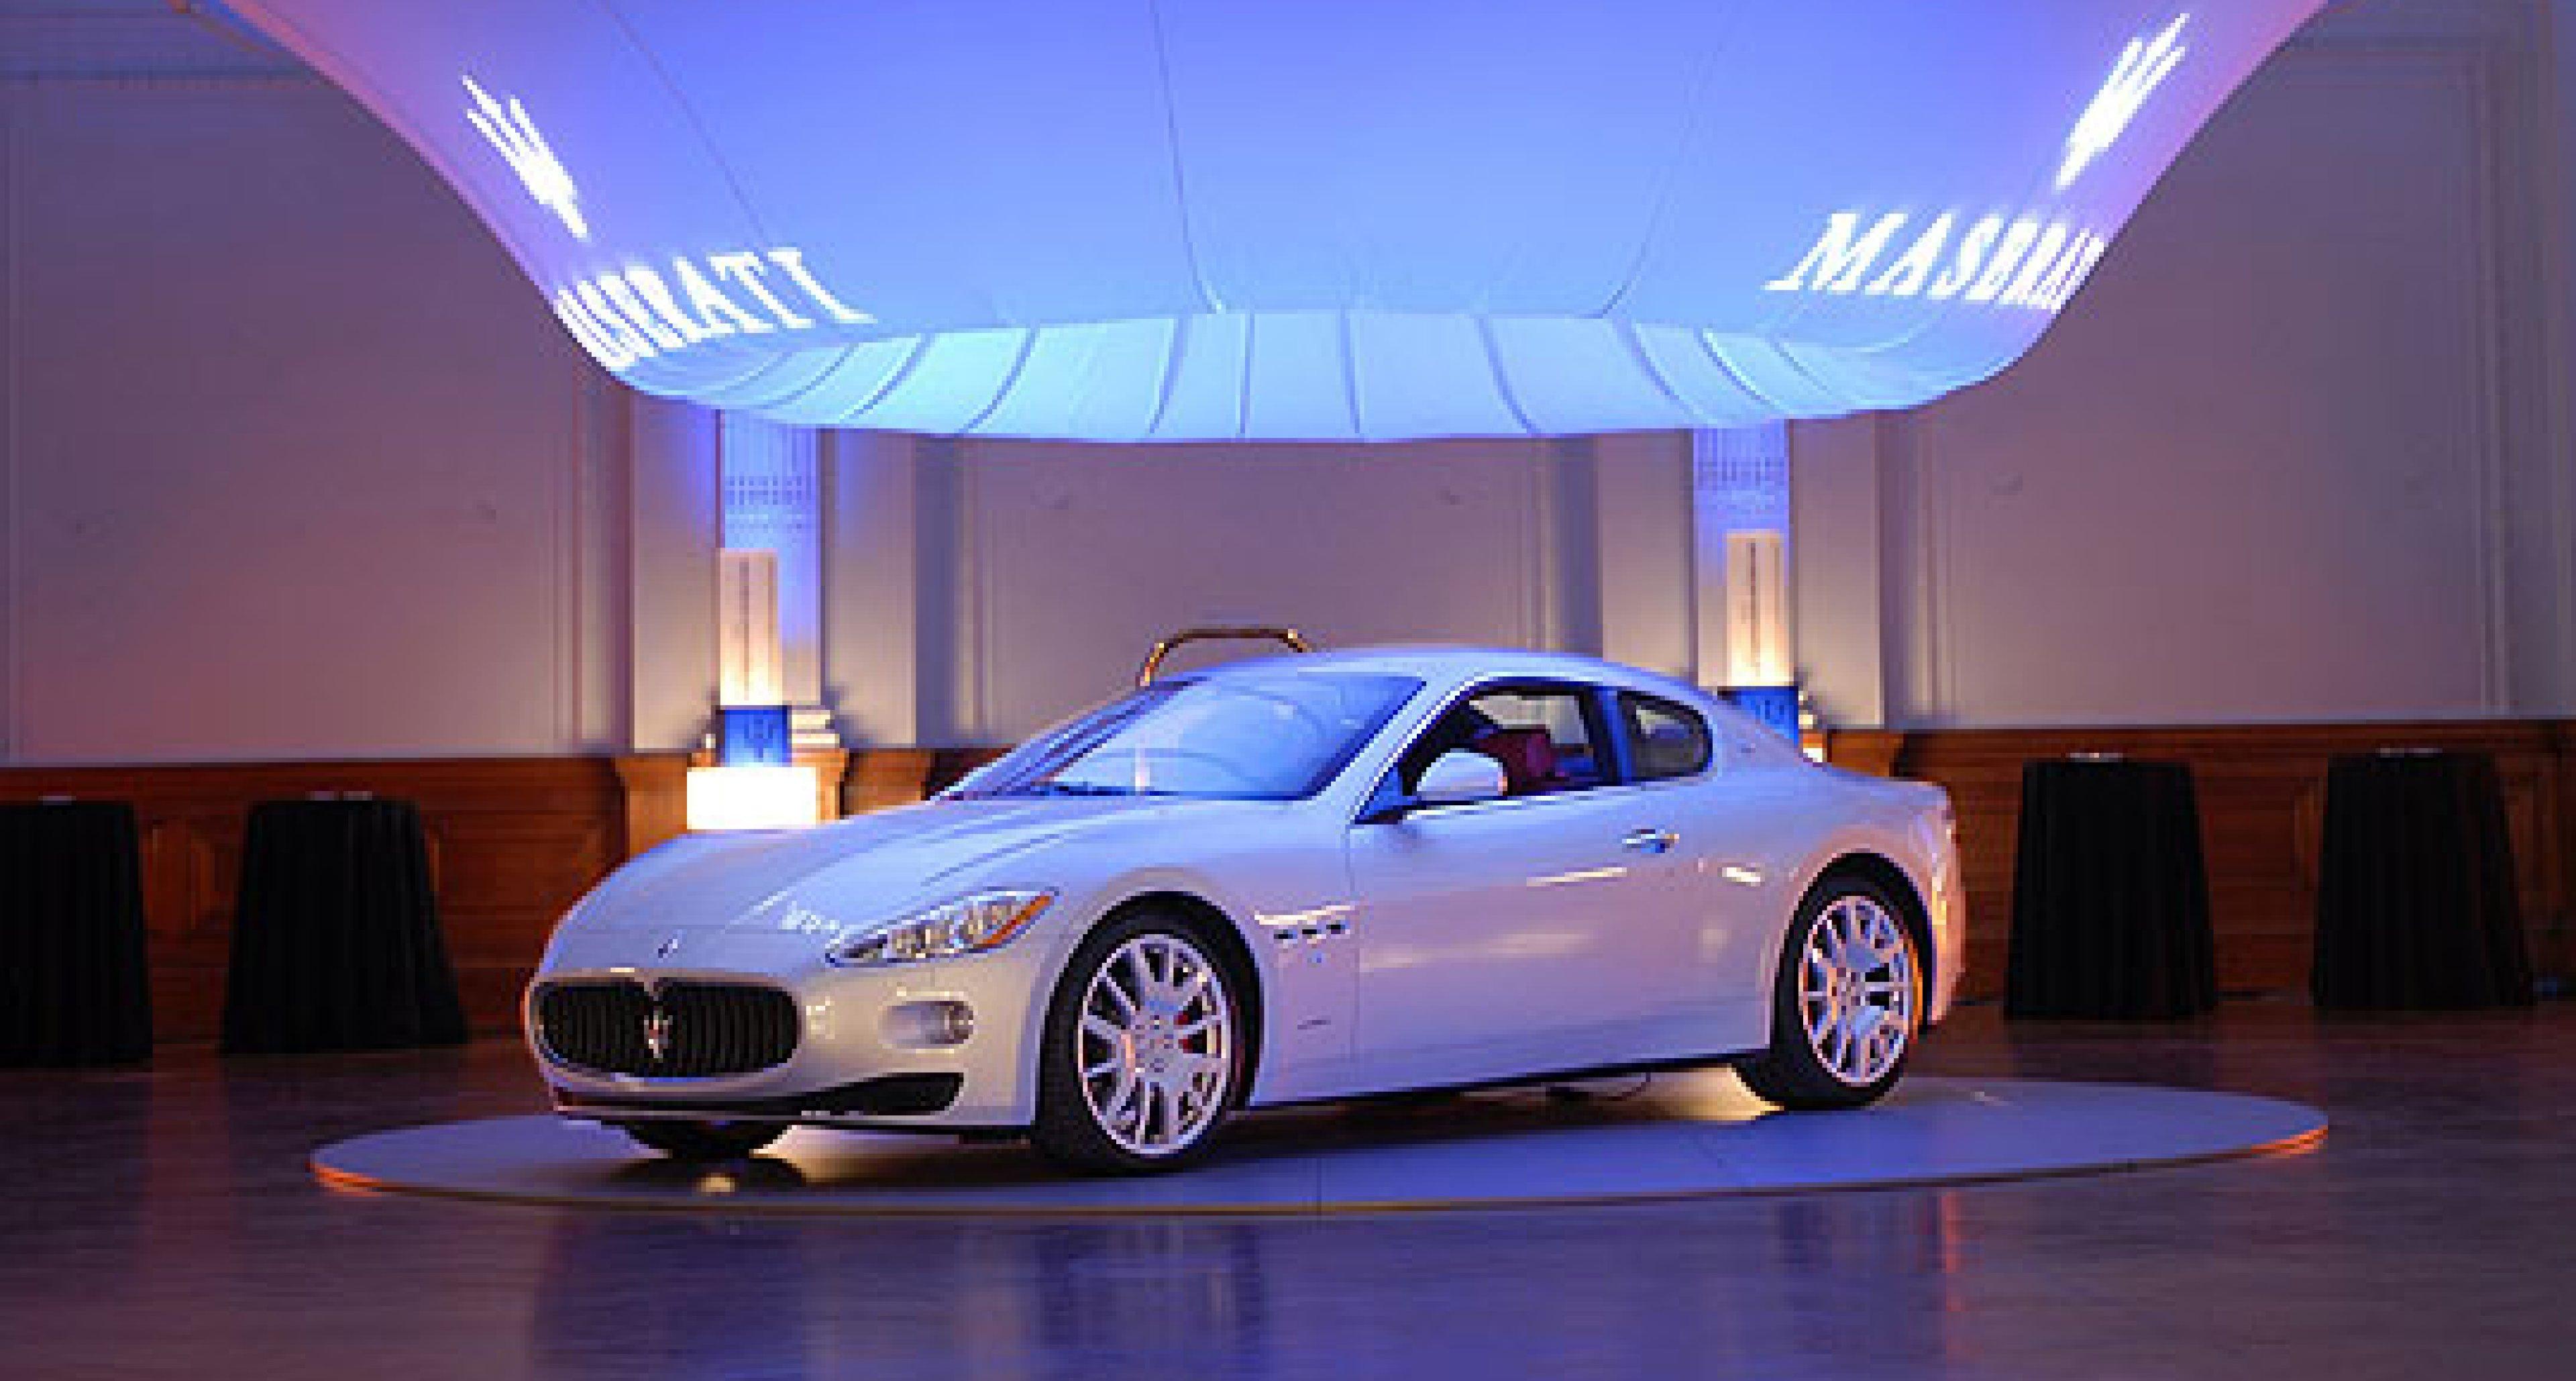 Maserati GranTurismo debuts in London and at the Goodwood Festival